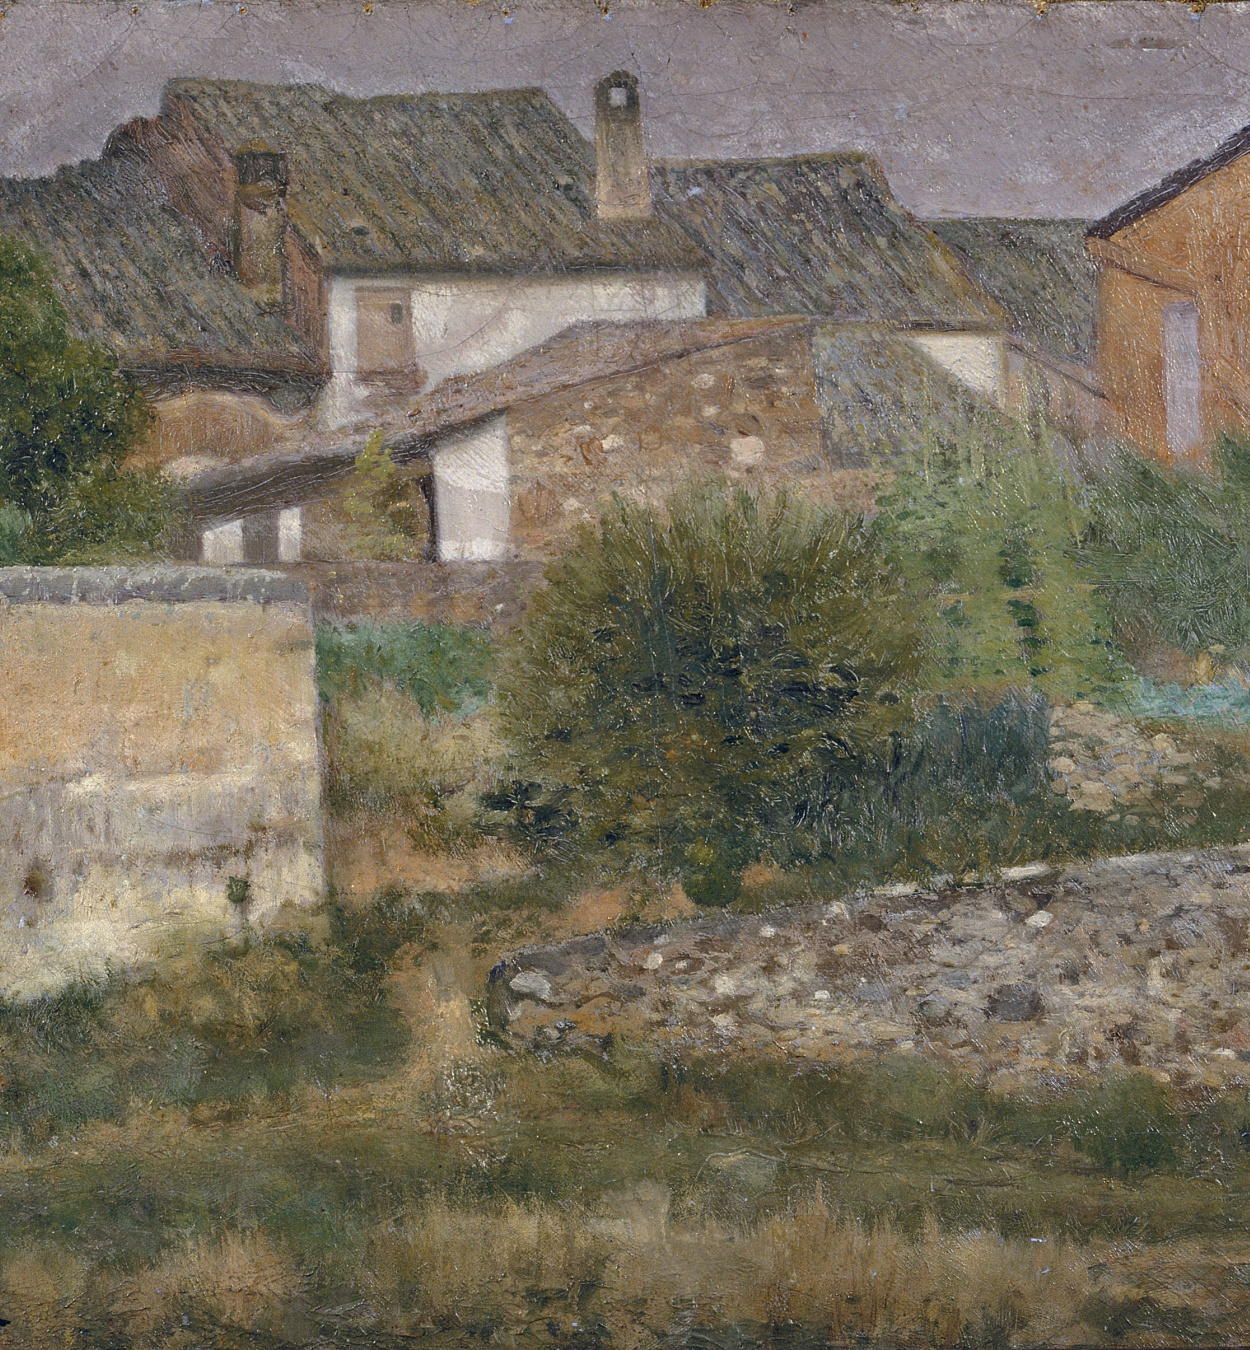 Nicolau Raurich - Un rincón de Sant Cugat del Vallès - Hacia 1906